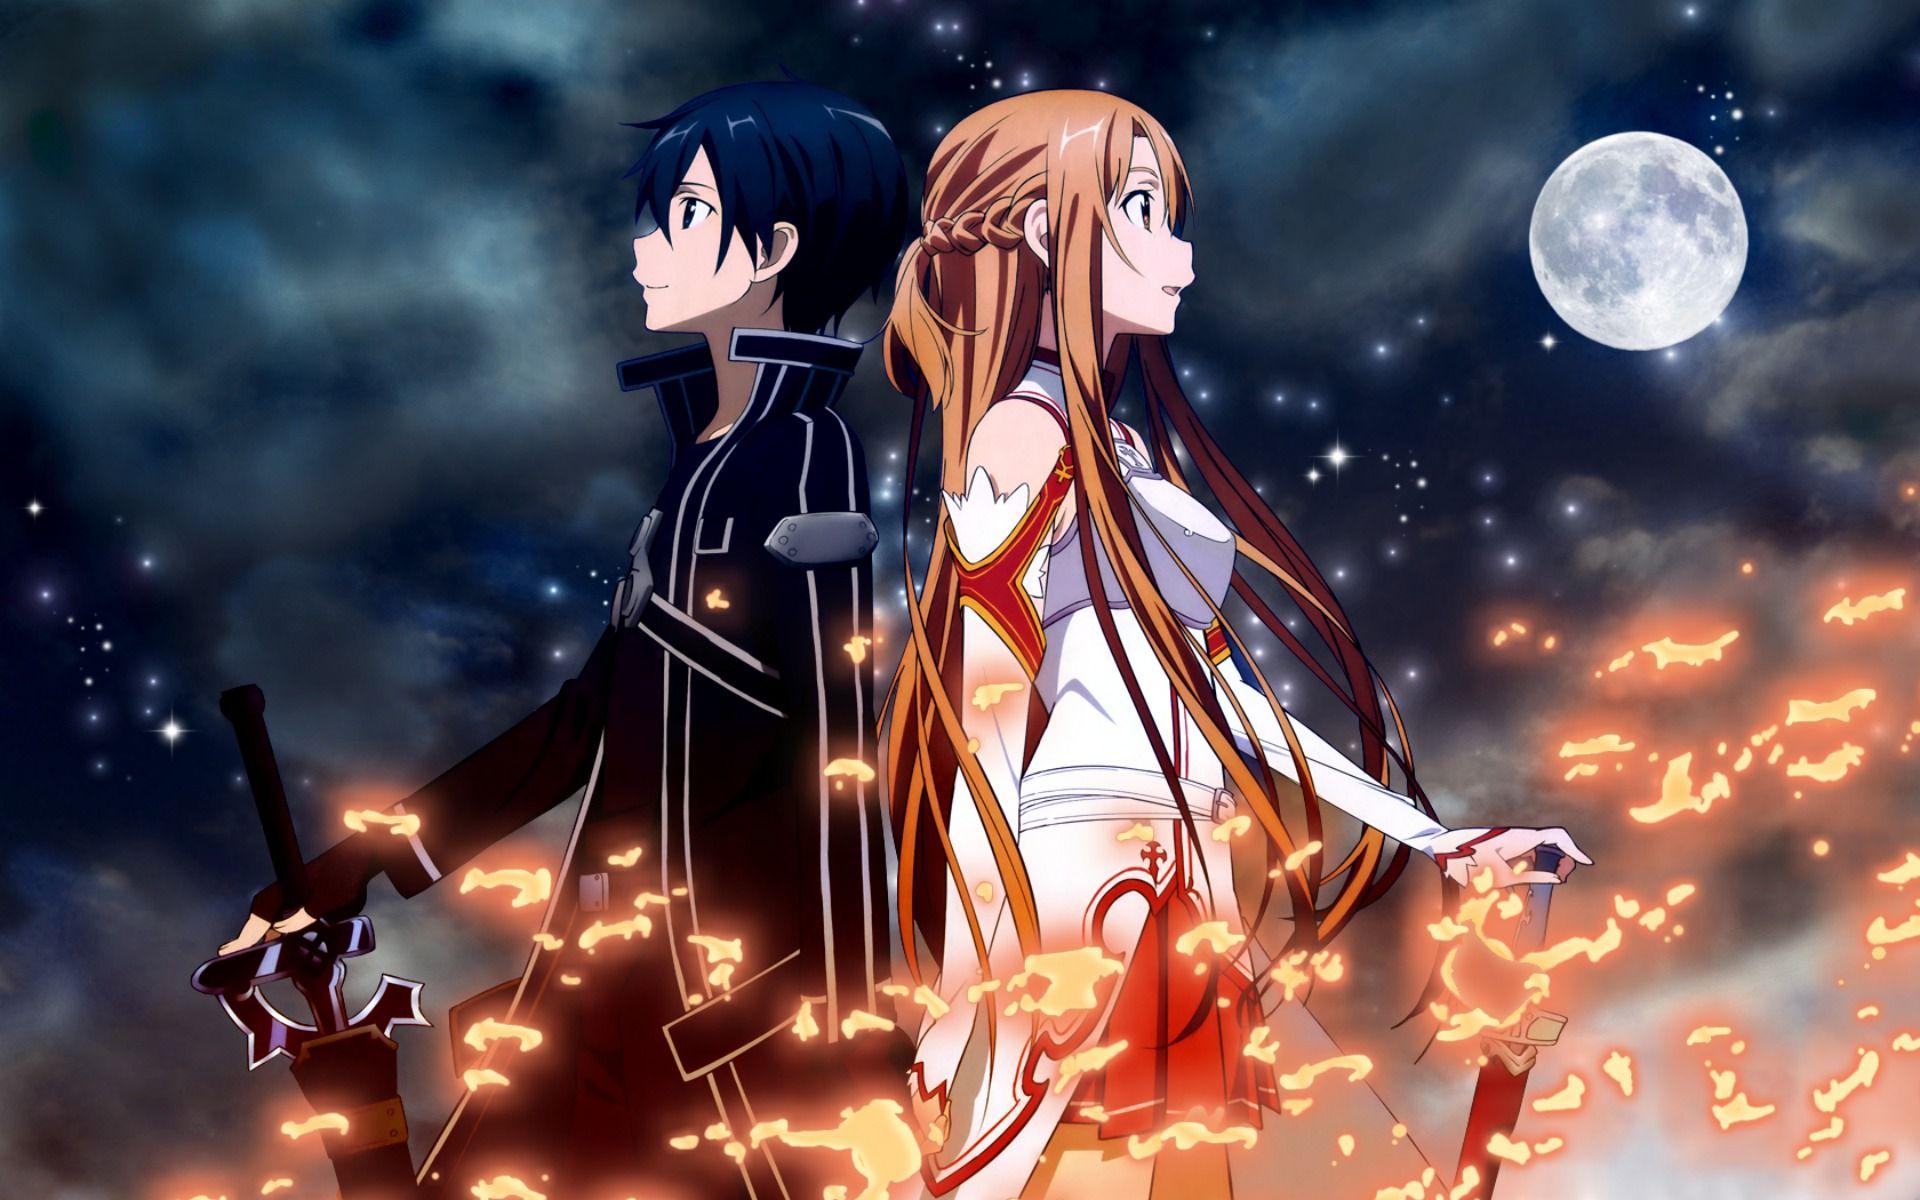 Pin by Anita on Anime/Manga FTW Sword art online